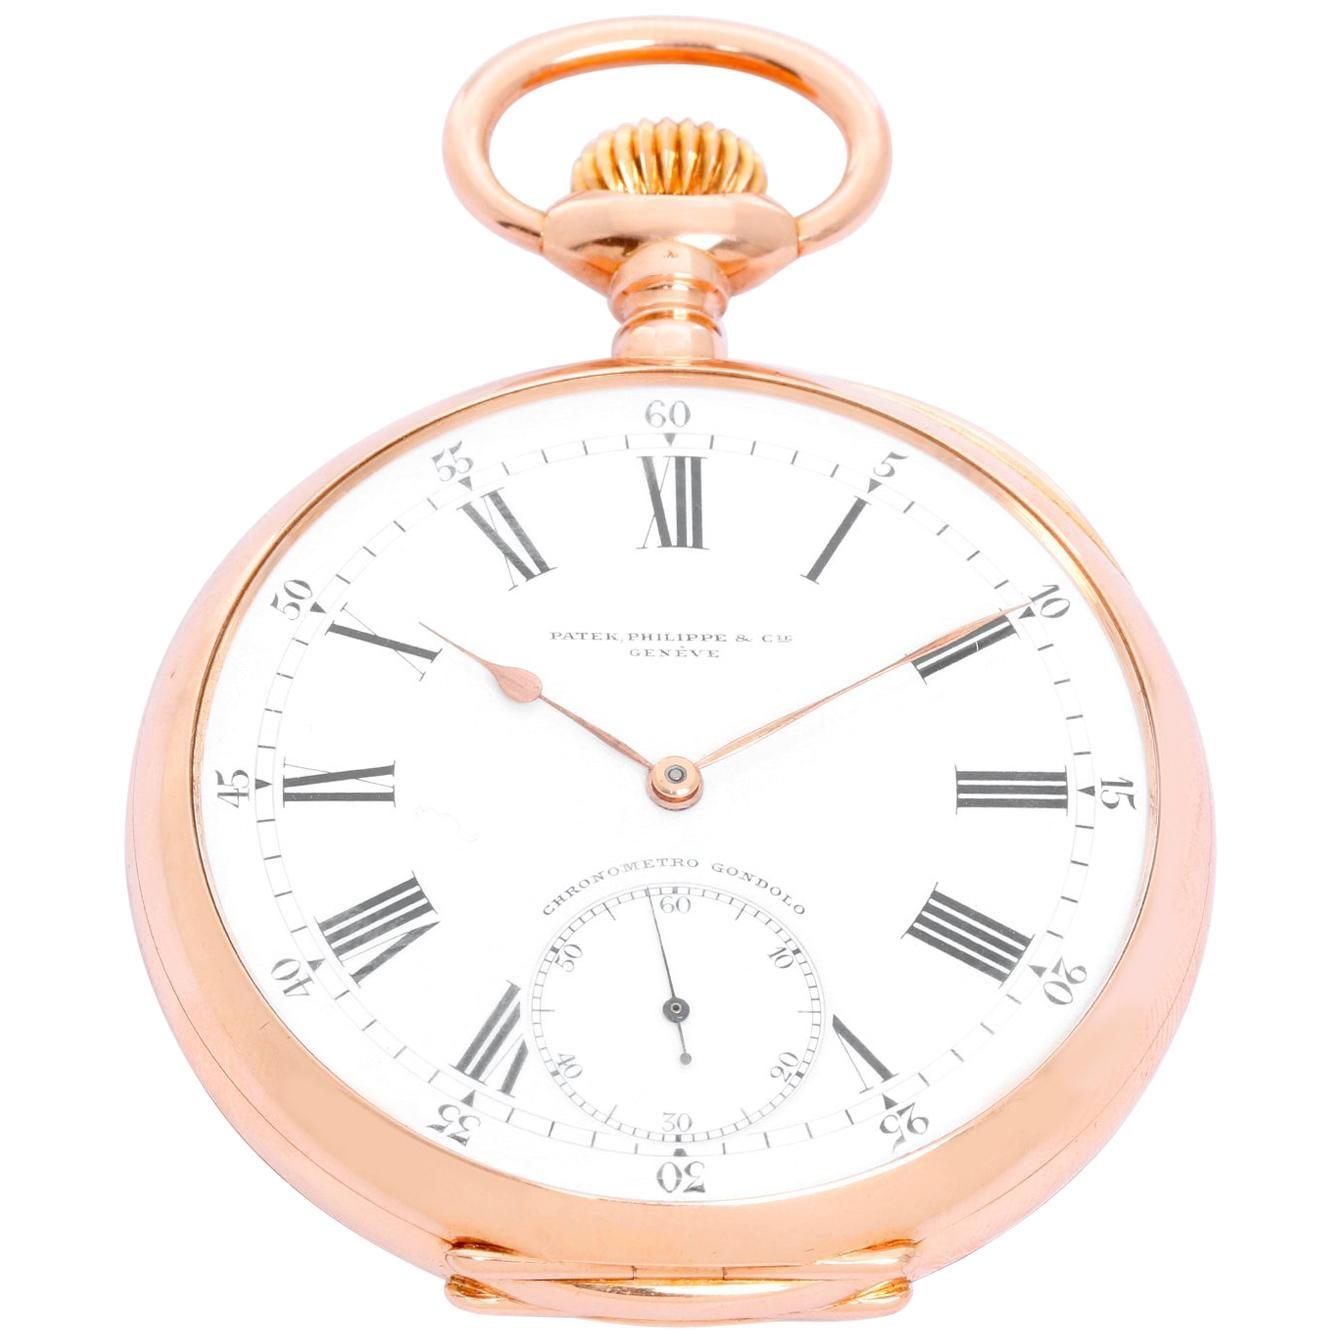 Patek Phillipe Chronometro Gondolo Pocket Watch Porcelain Dial High Quality Goods Costume